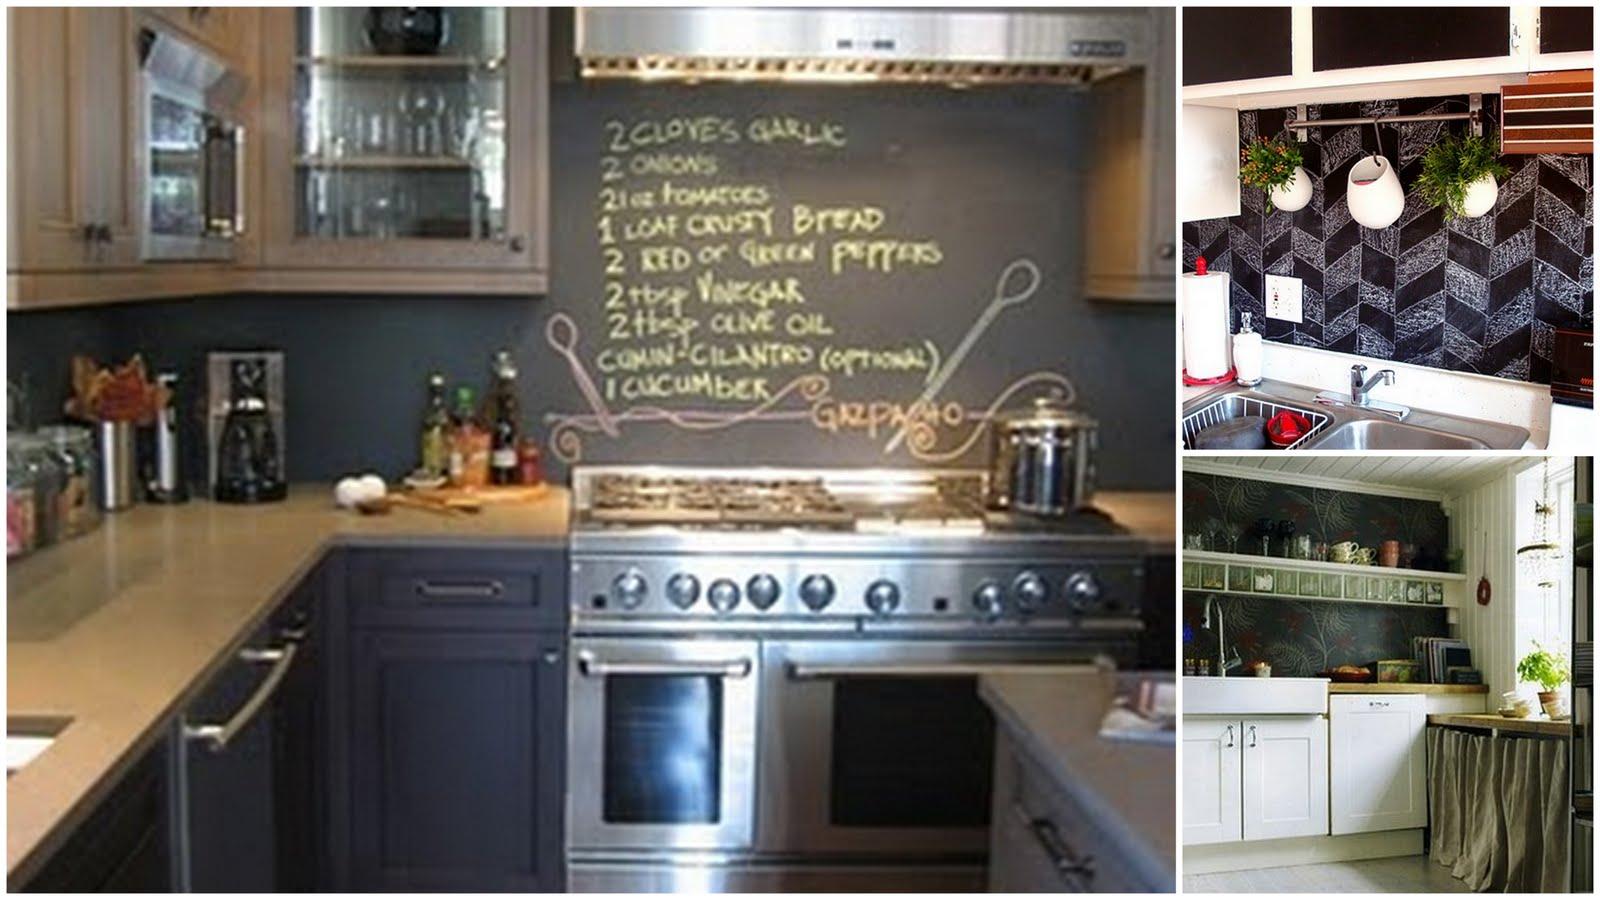 House on ashwell lane no tile backsplash ideas part 2 for Alternative kitchen backsplash ideas